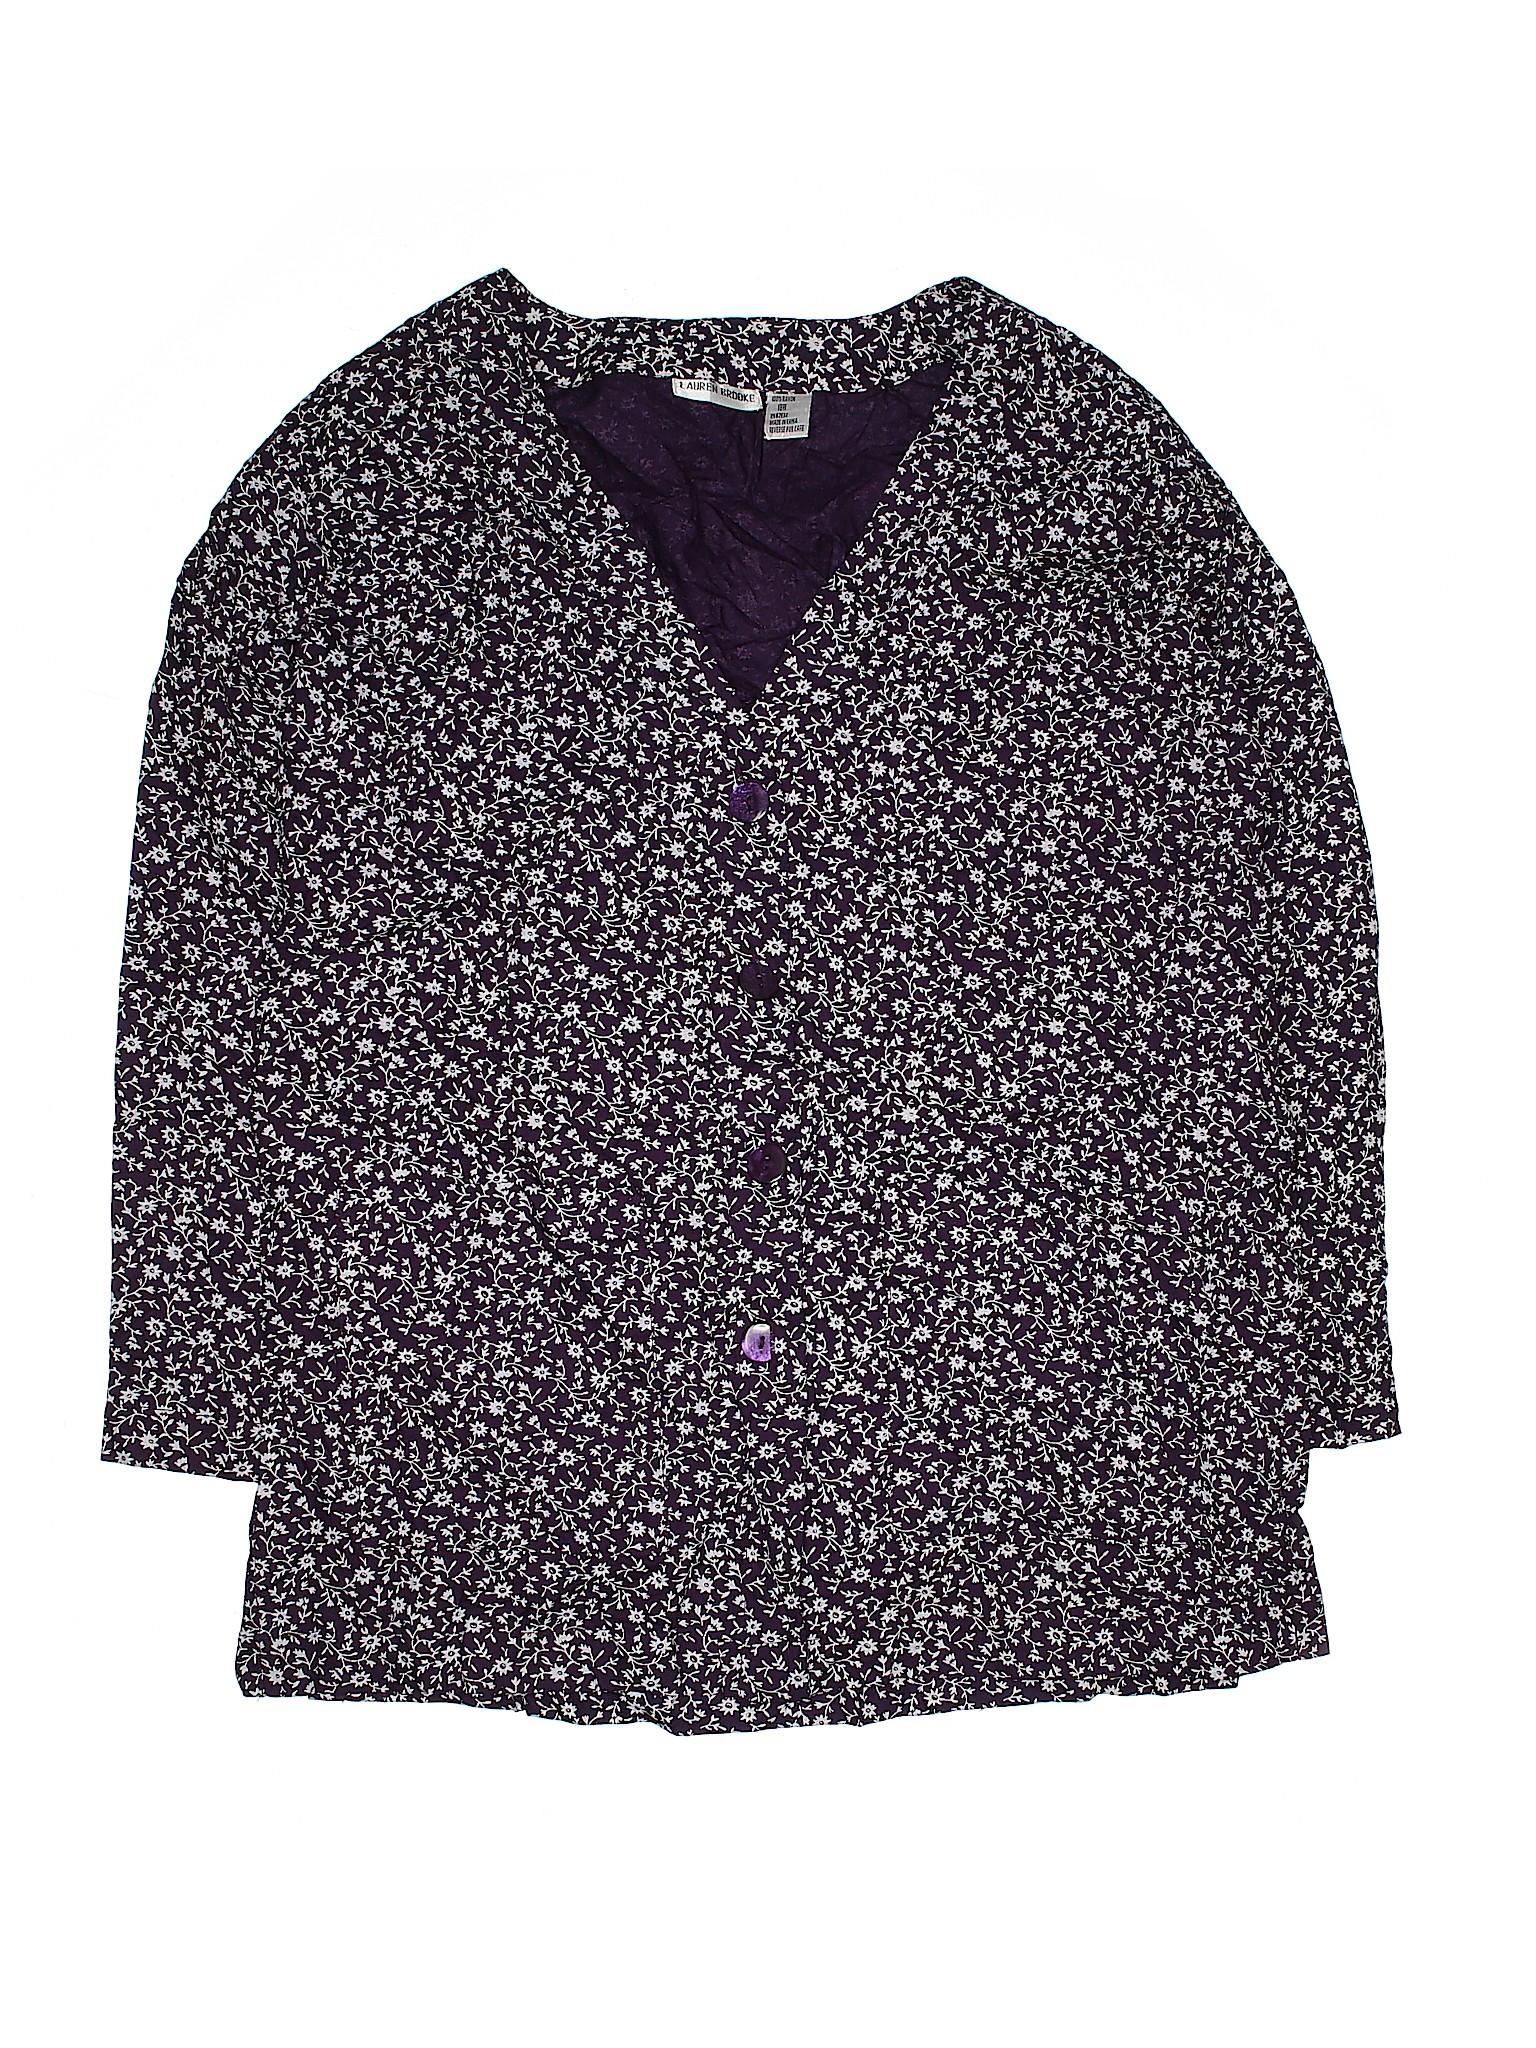 Cardigan Brooke Boutique winter Boutique winter Lauren zxYXTq4wn